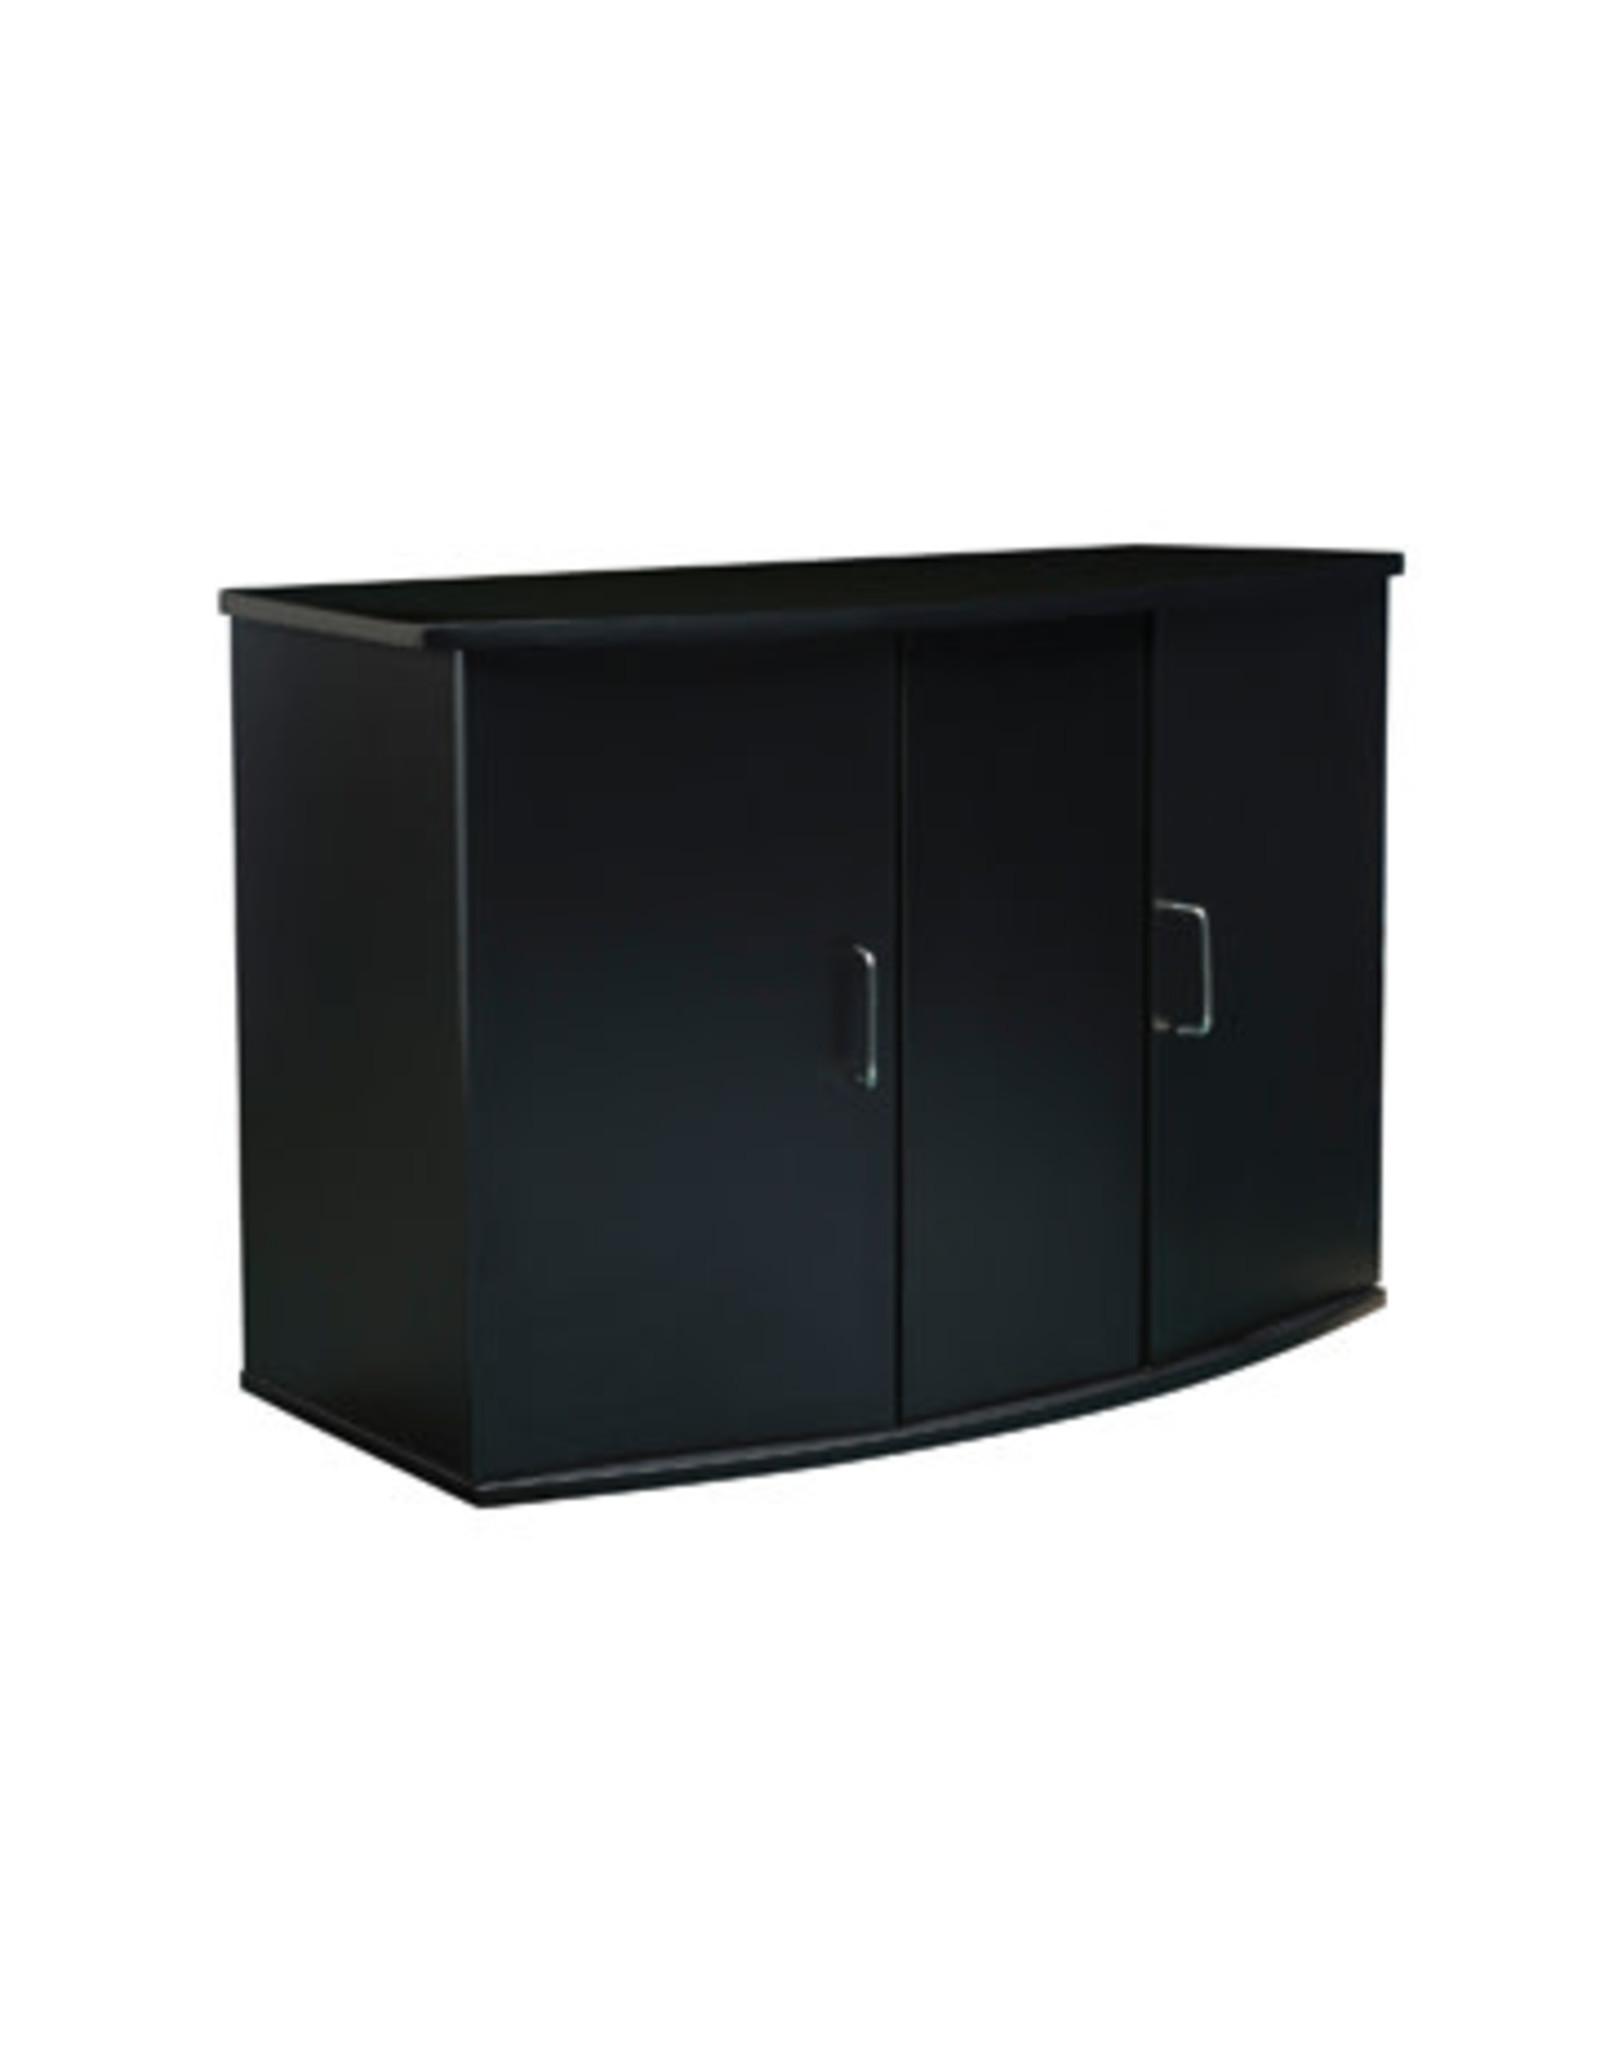 "Fluval Fluval Bow Front Aquarium Cabinet - 45 Bow - 37"" x 16.5"" x 26"" (94 cm x 42 cm x 66 cm) - Black"